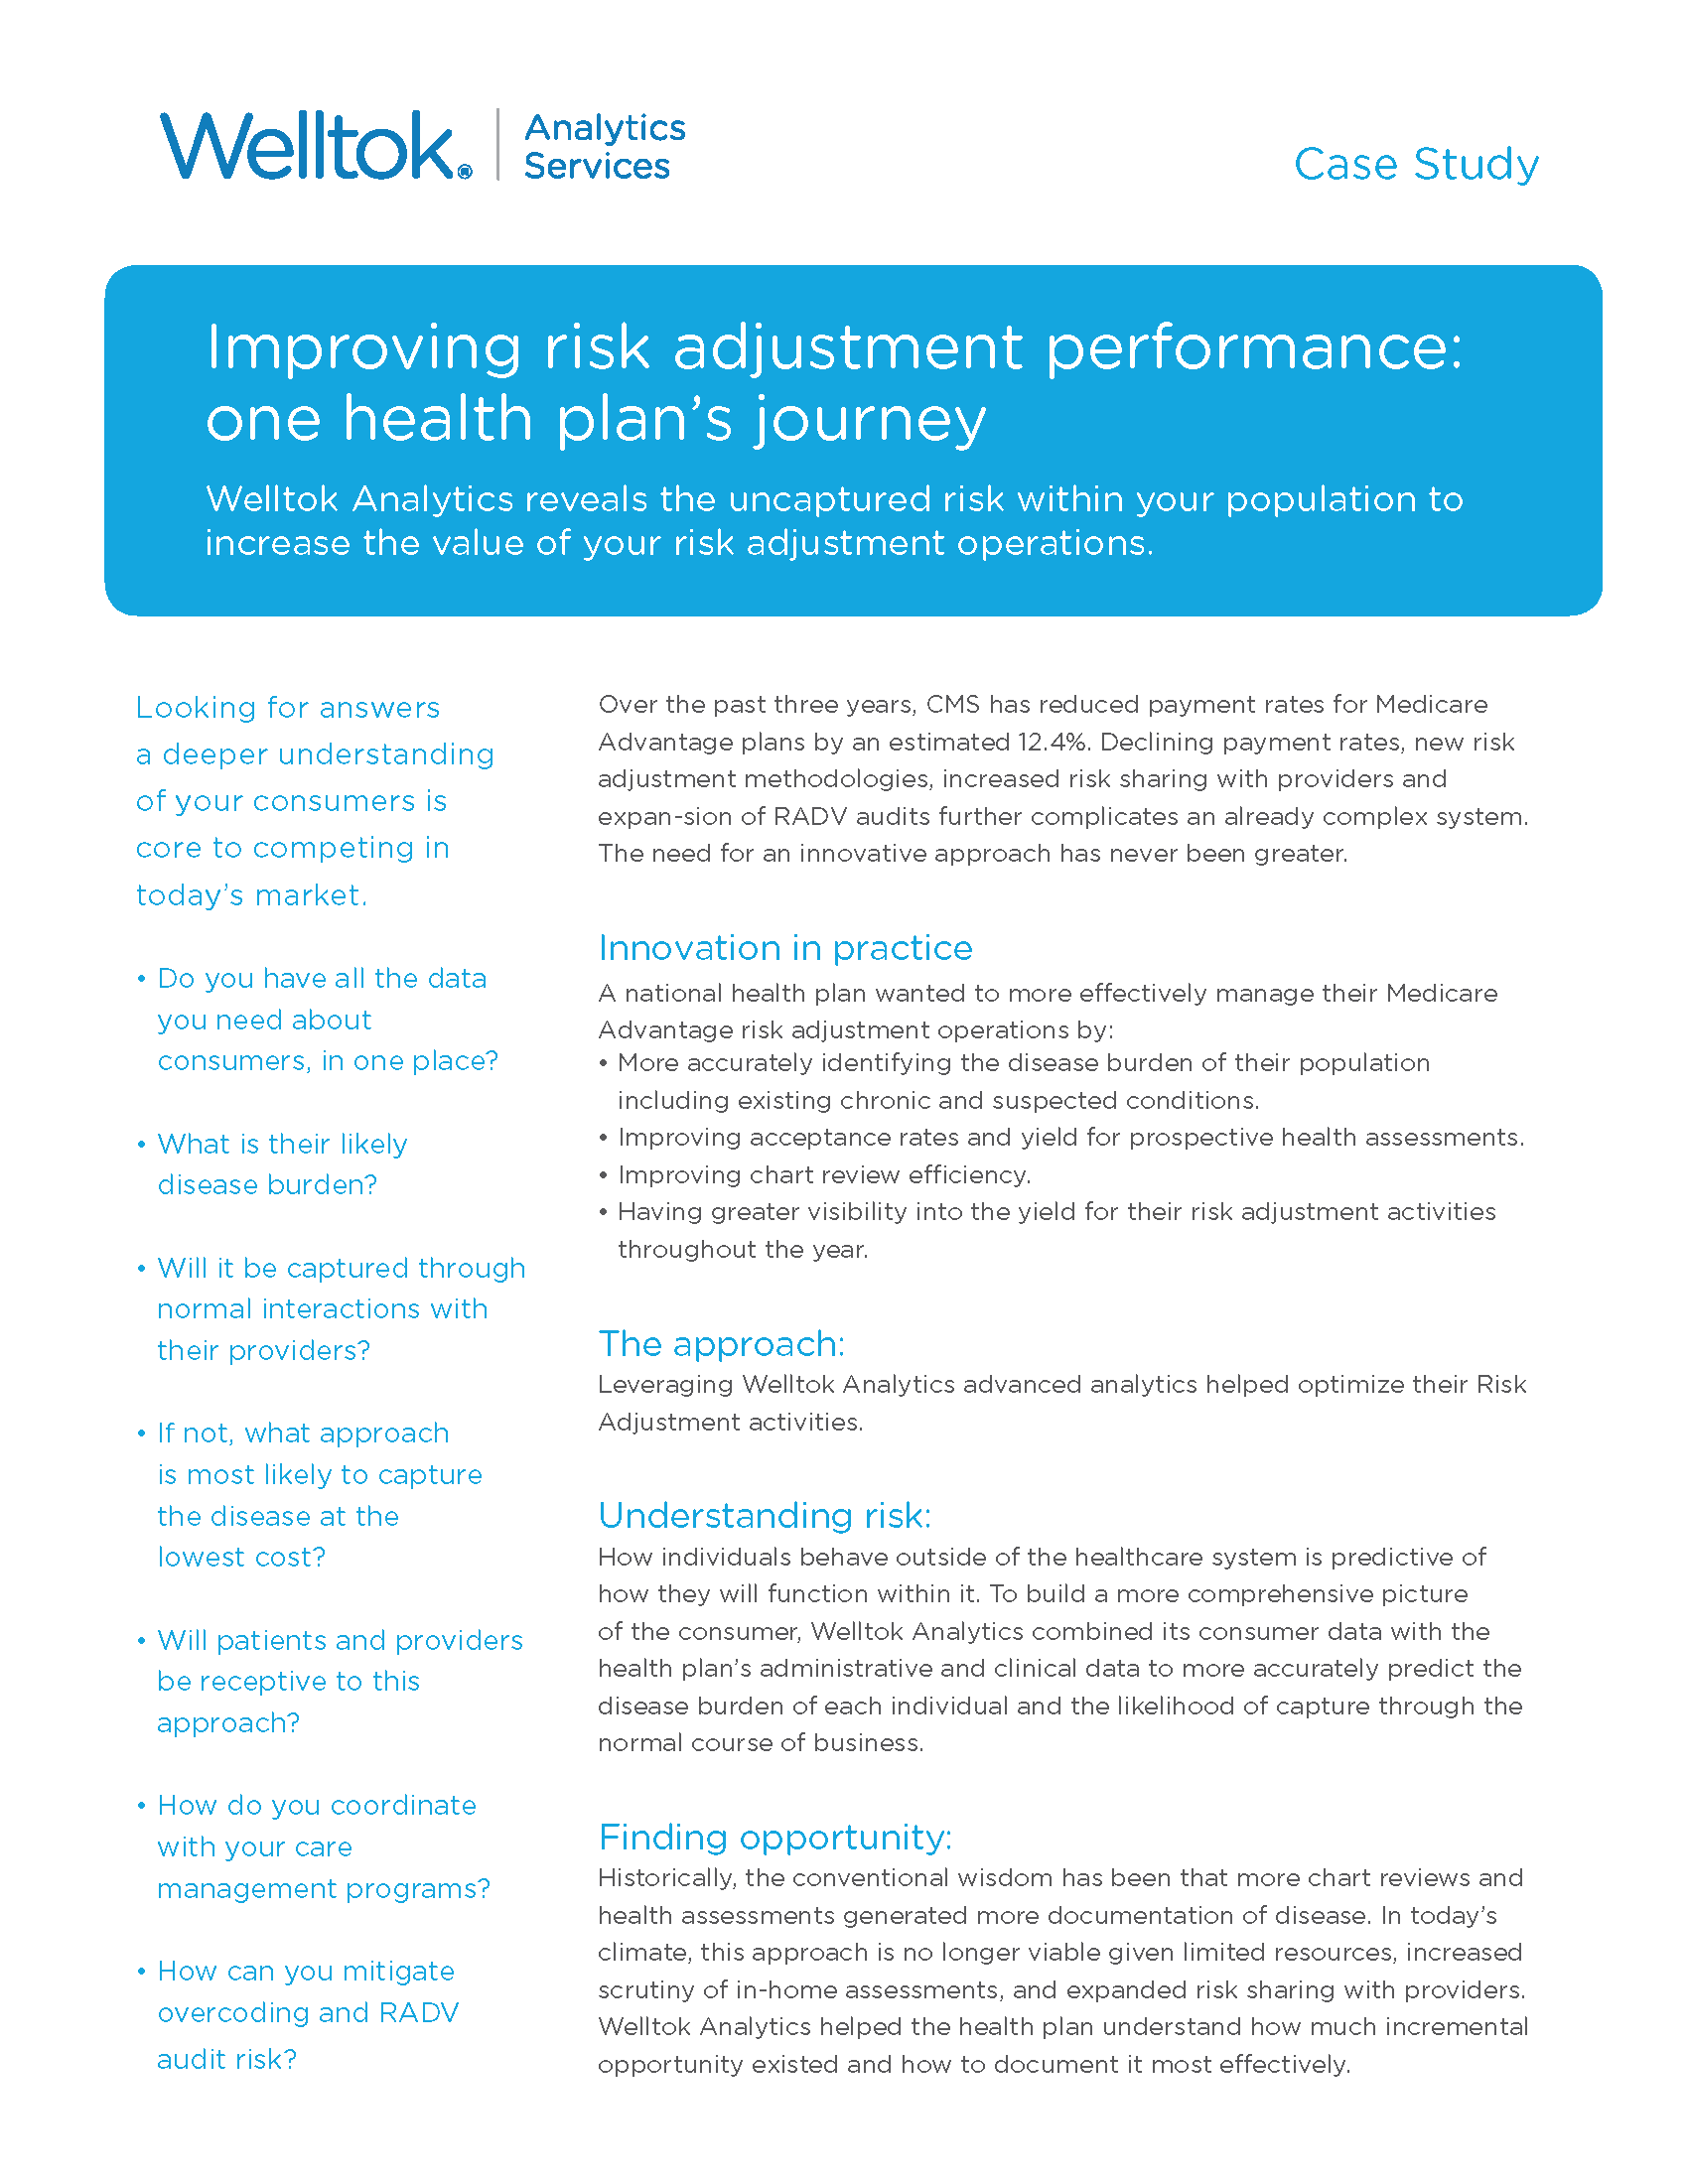 welltok_analytics_risk_adjustment_01.png